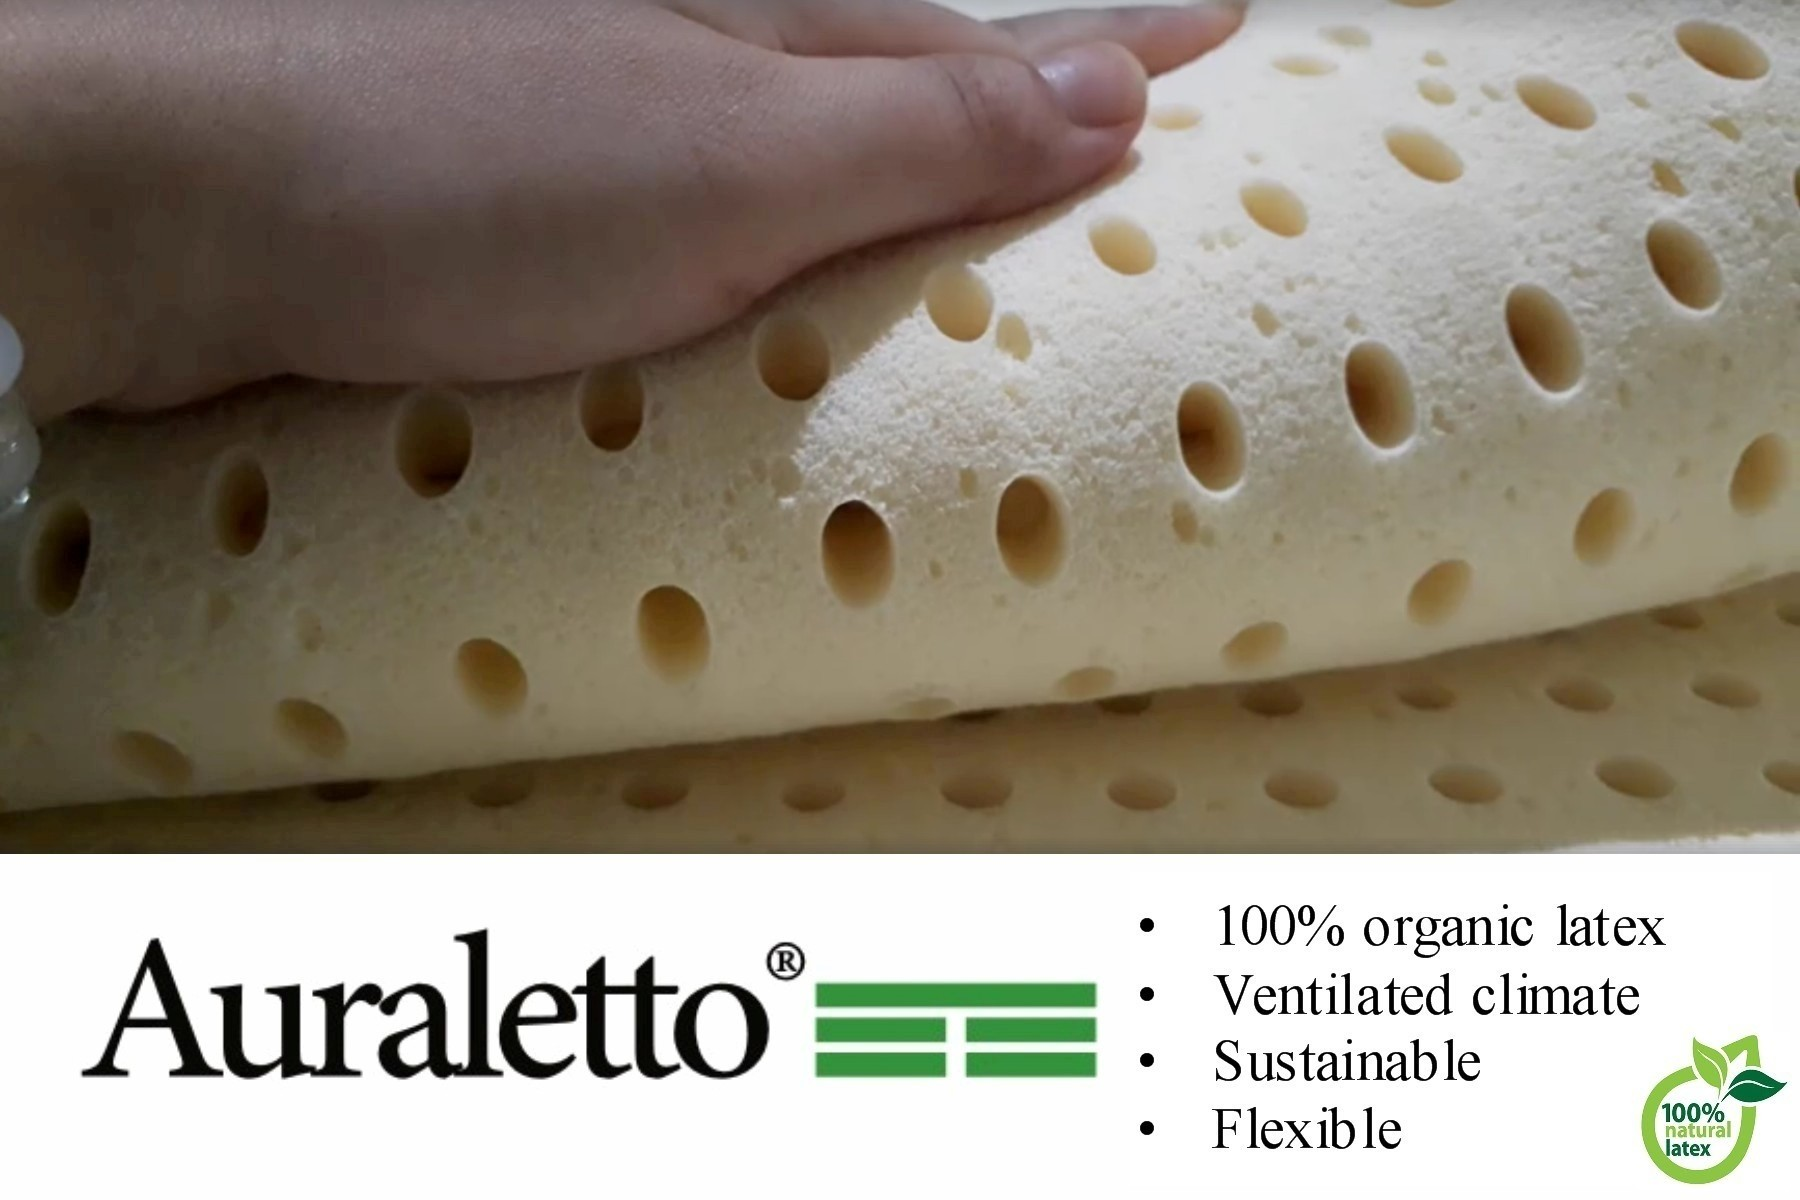 Auraletto - Kok Bedden merk natuurlatex matrassen